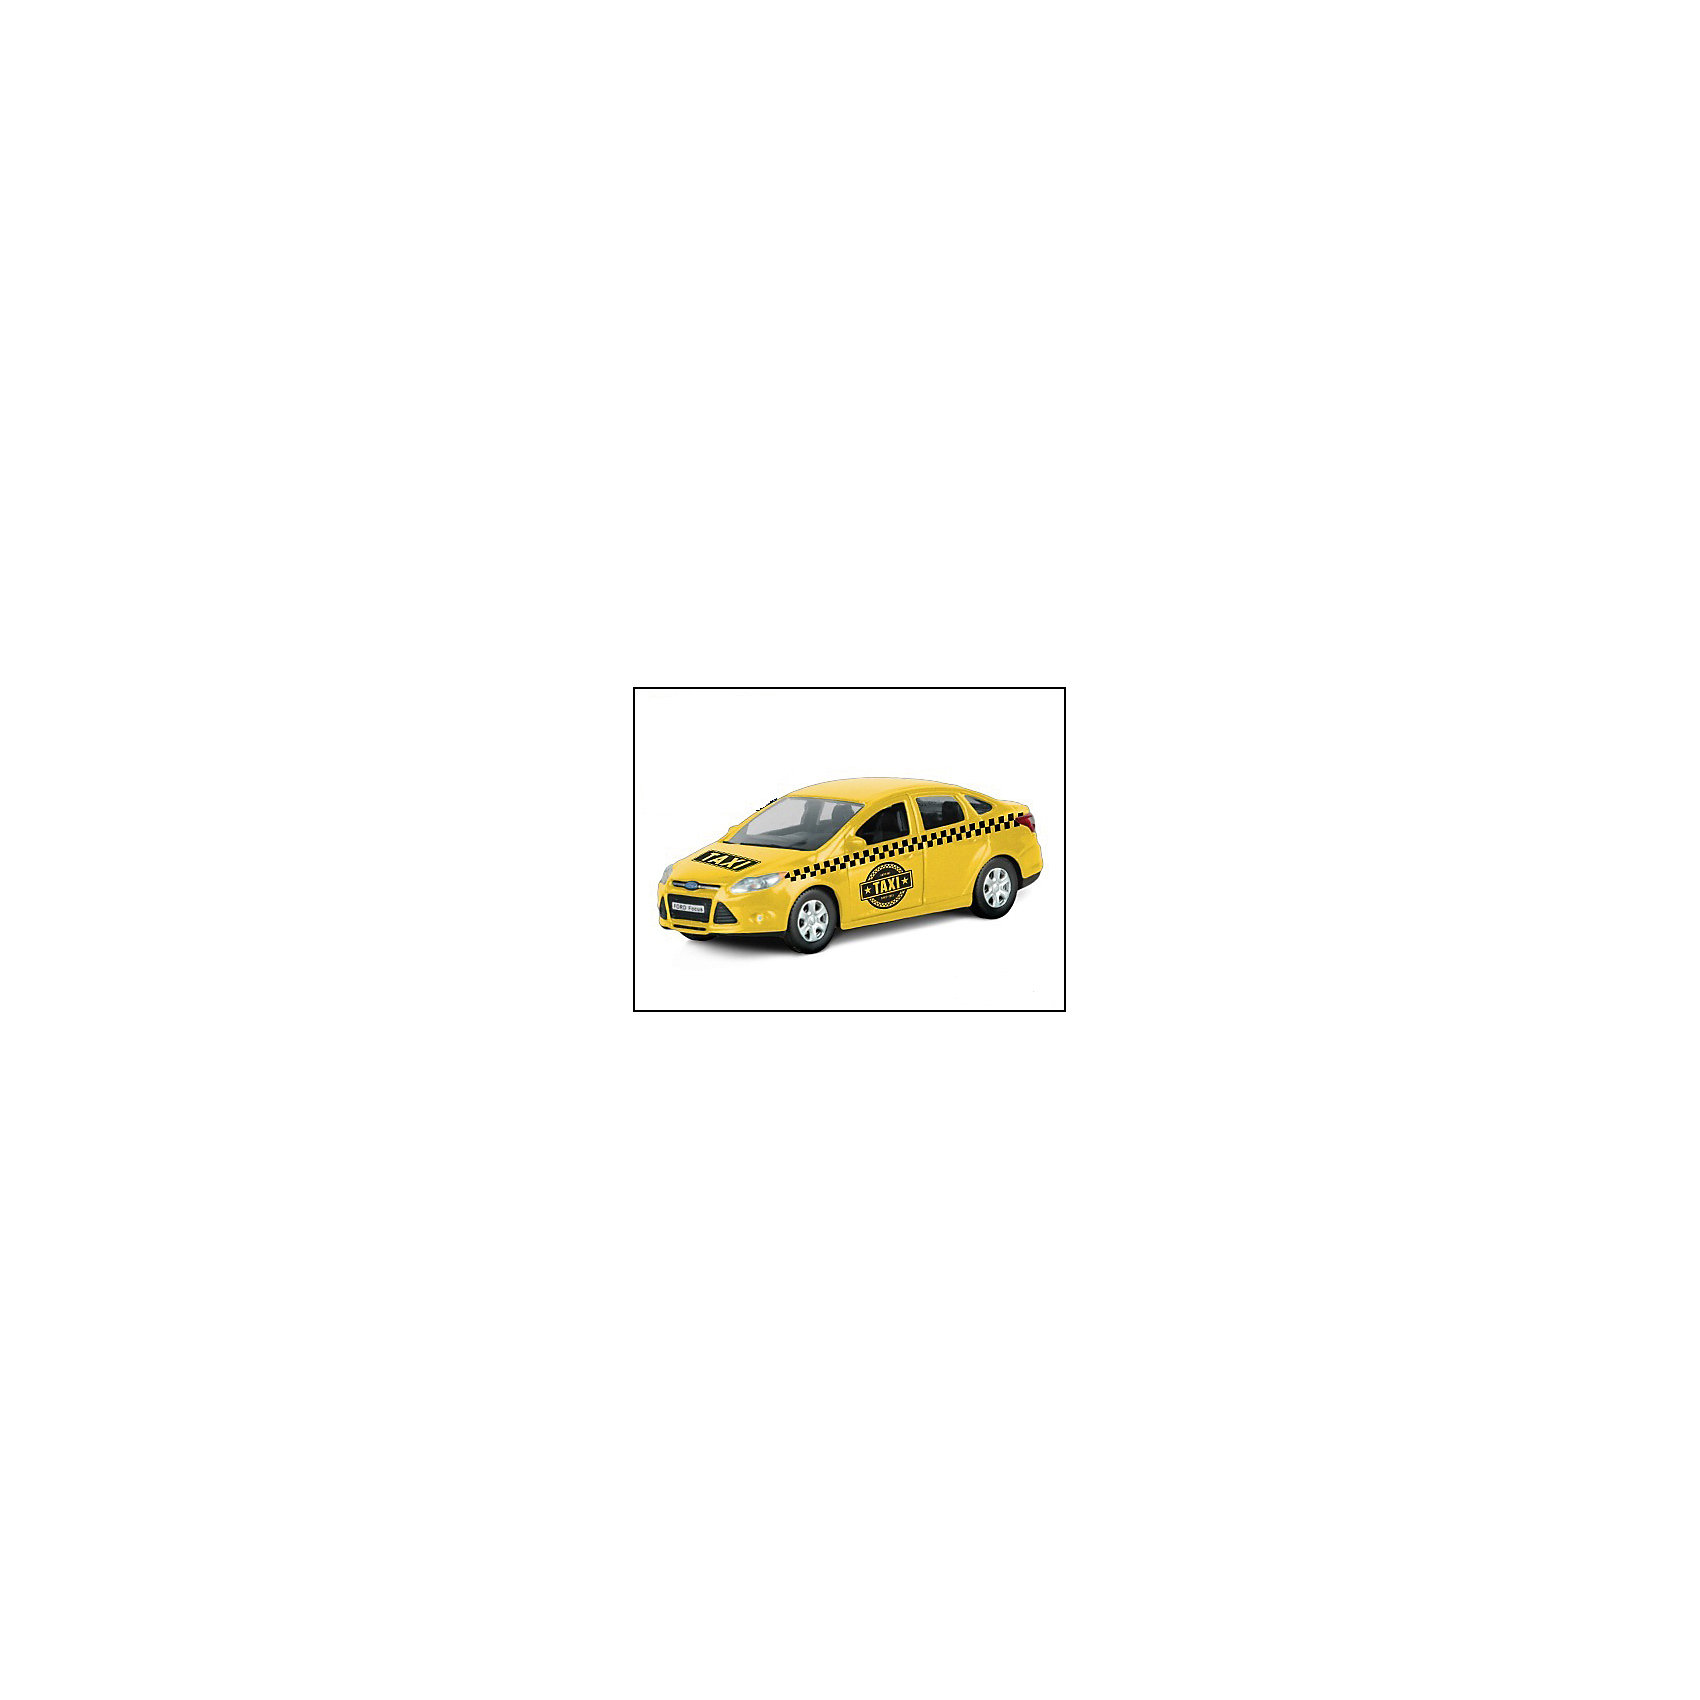 Машинка Ford Focus такси 1:36, AutotimeМашинки<br><br><br>Ширина мм: 165<br>Глубина мм: 57<br>Высота мм: 75<br>Вес г: 13<br>Возраст от месяцев: 36<br>Возраст до месяцев: 2147483647<br>Пол: Мужской<br>Возраст: Детский<br>SKU: 5583866